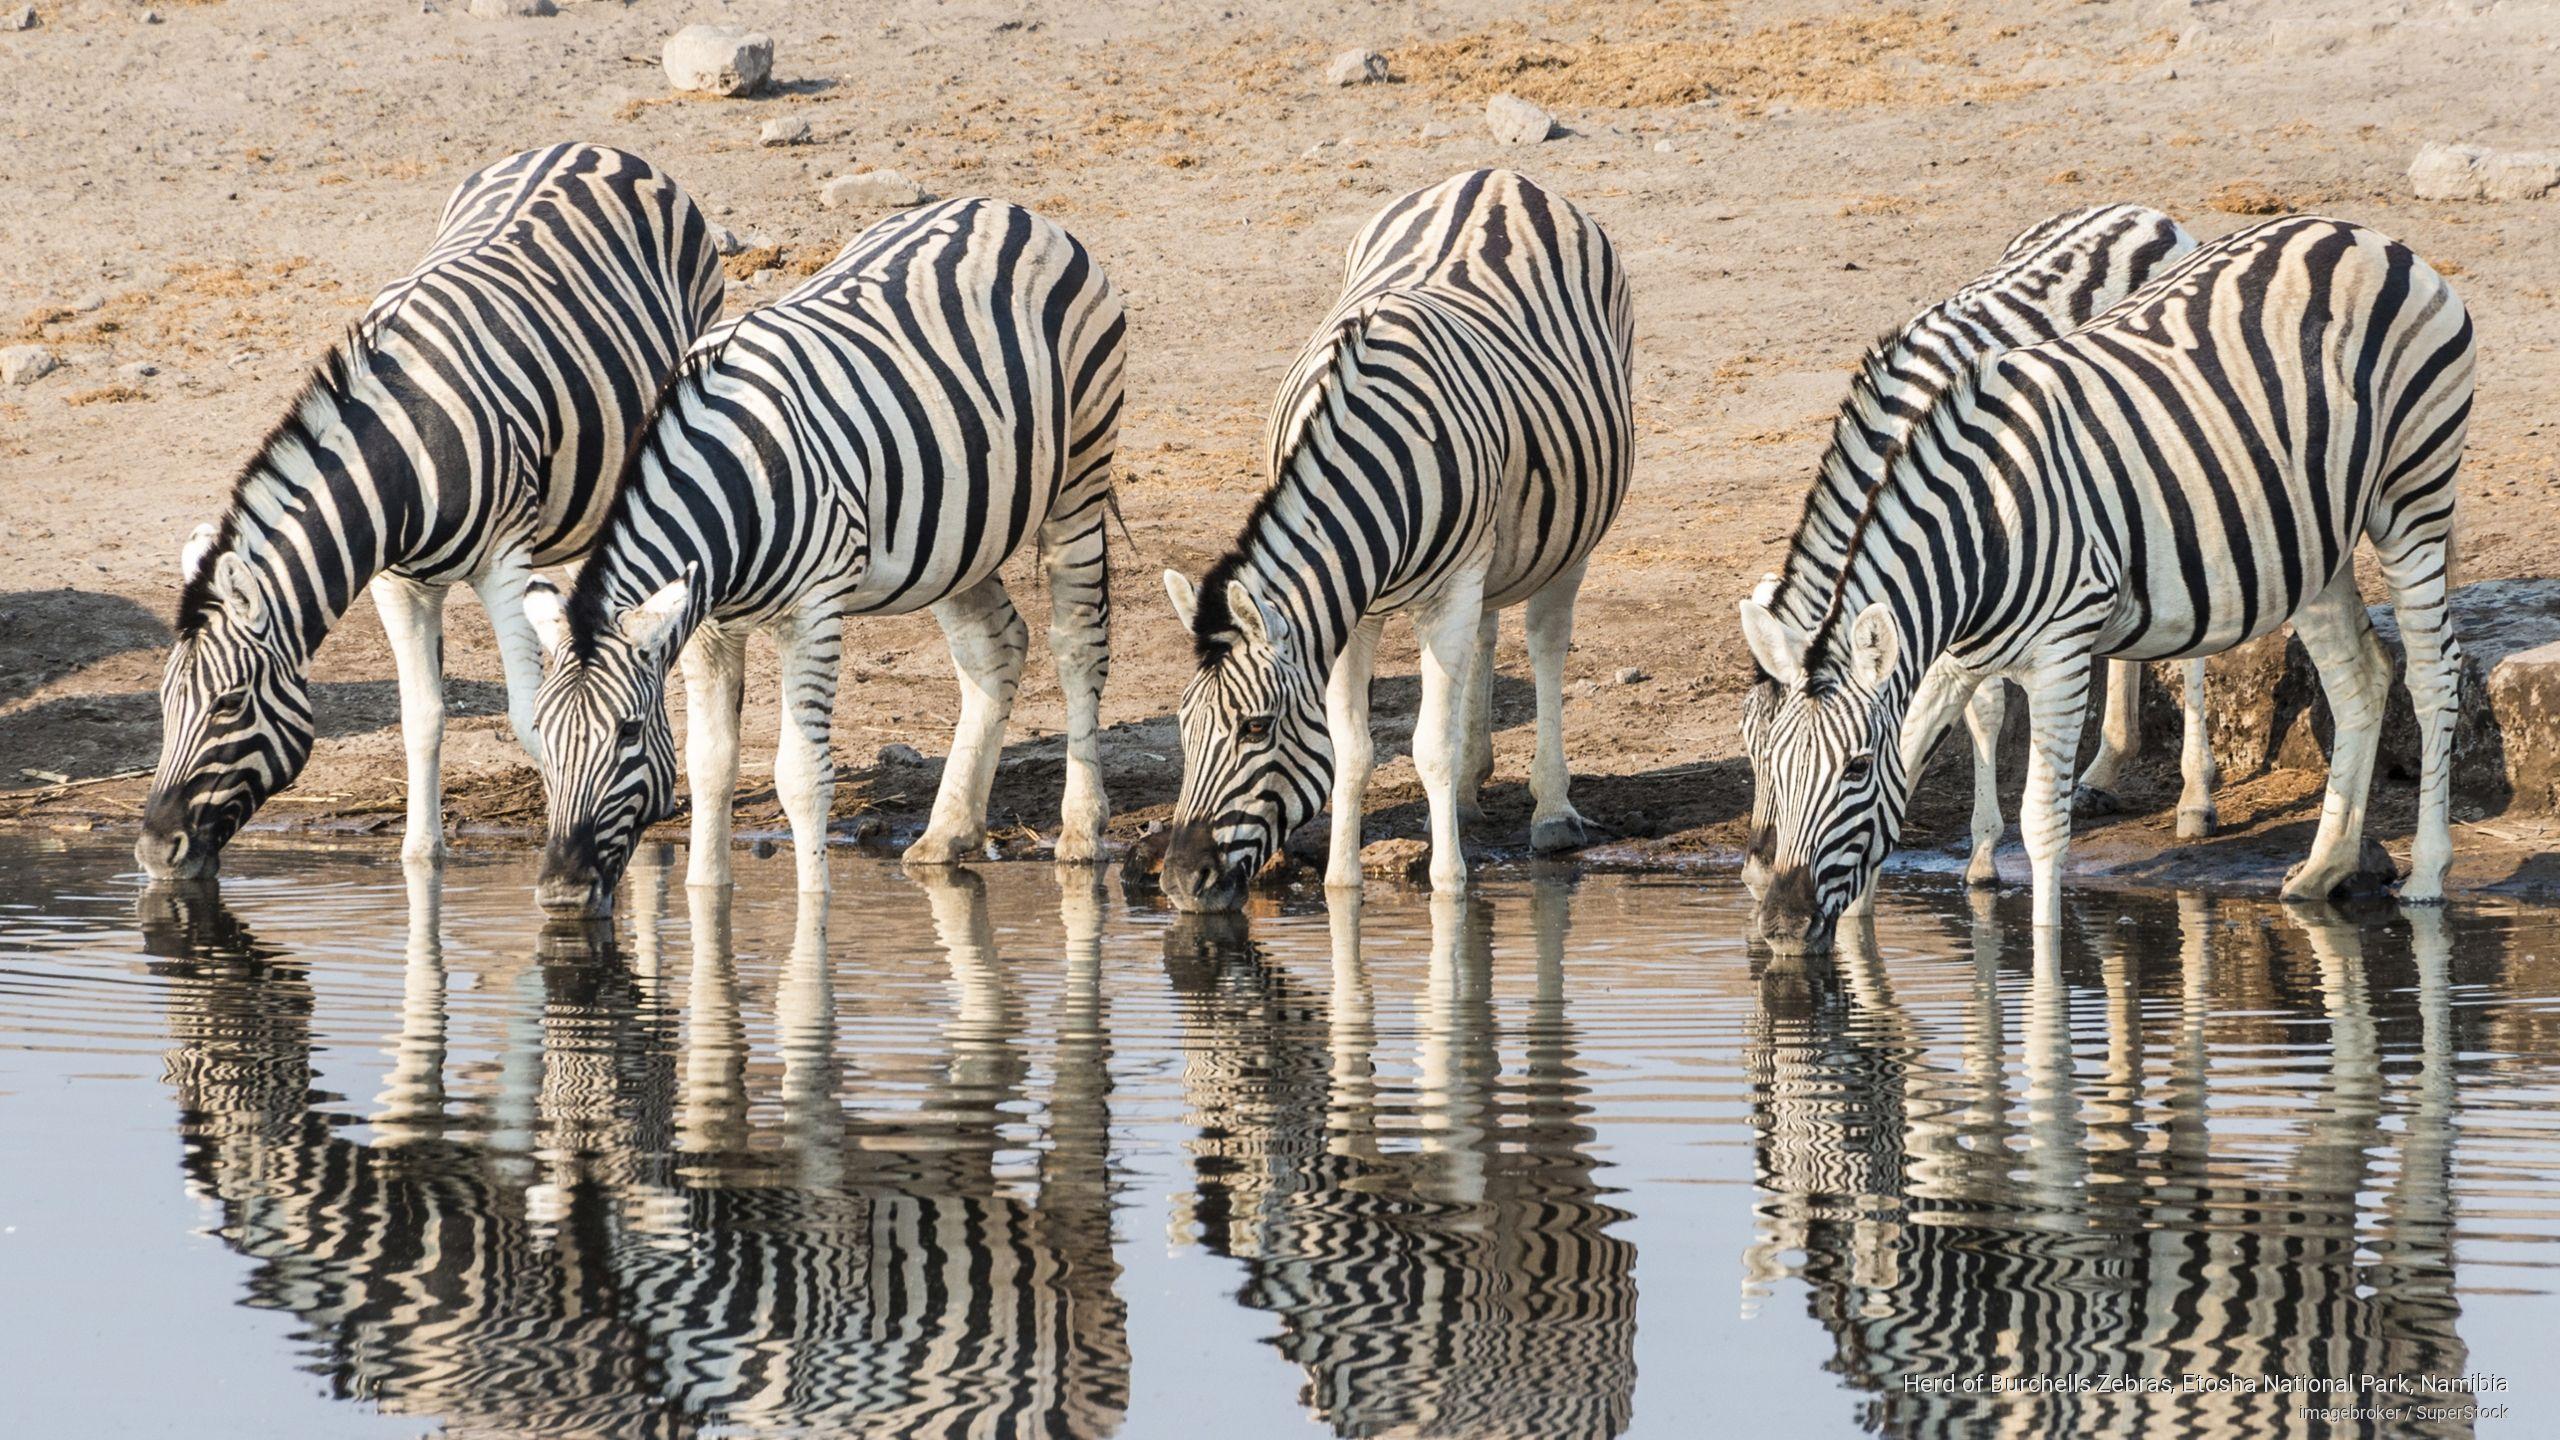 Herd of Zebras, Etosha N.P., Namibia by Imagebroker